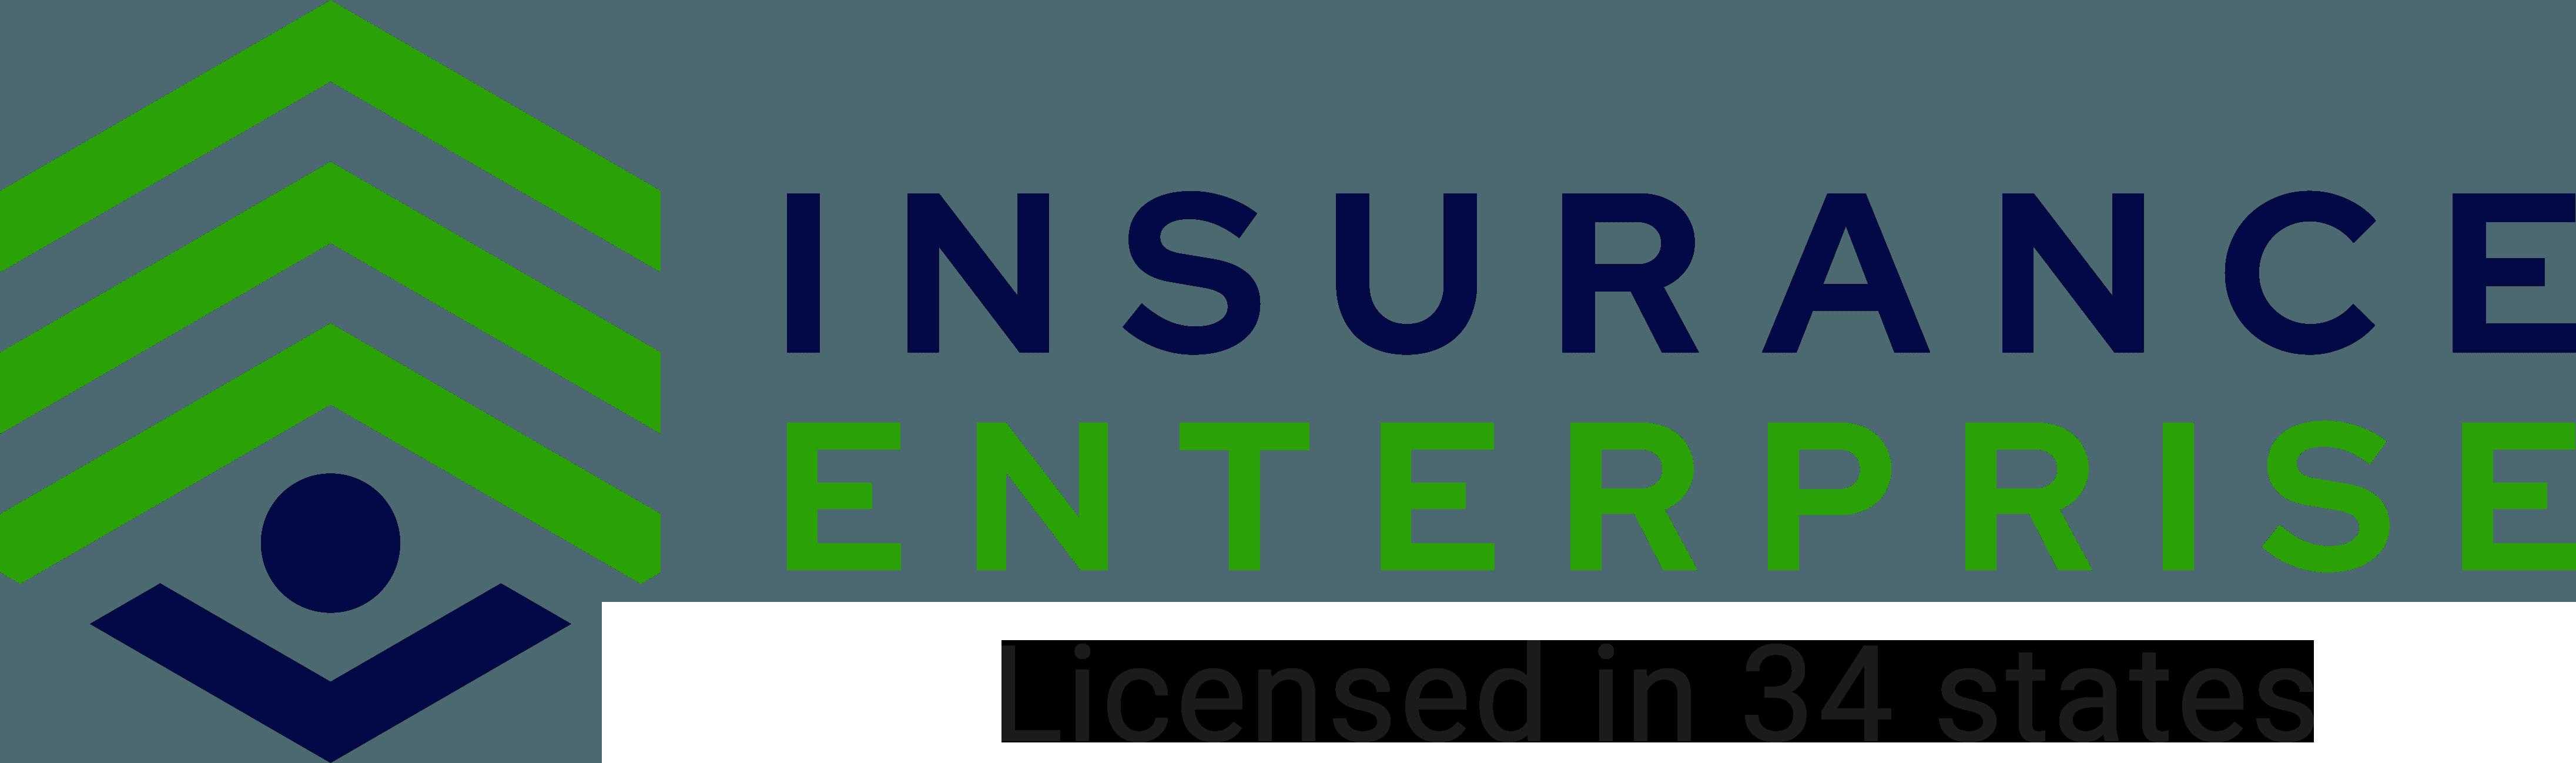 Insurance Enterprise